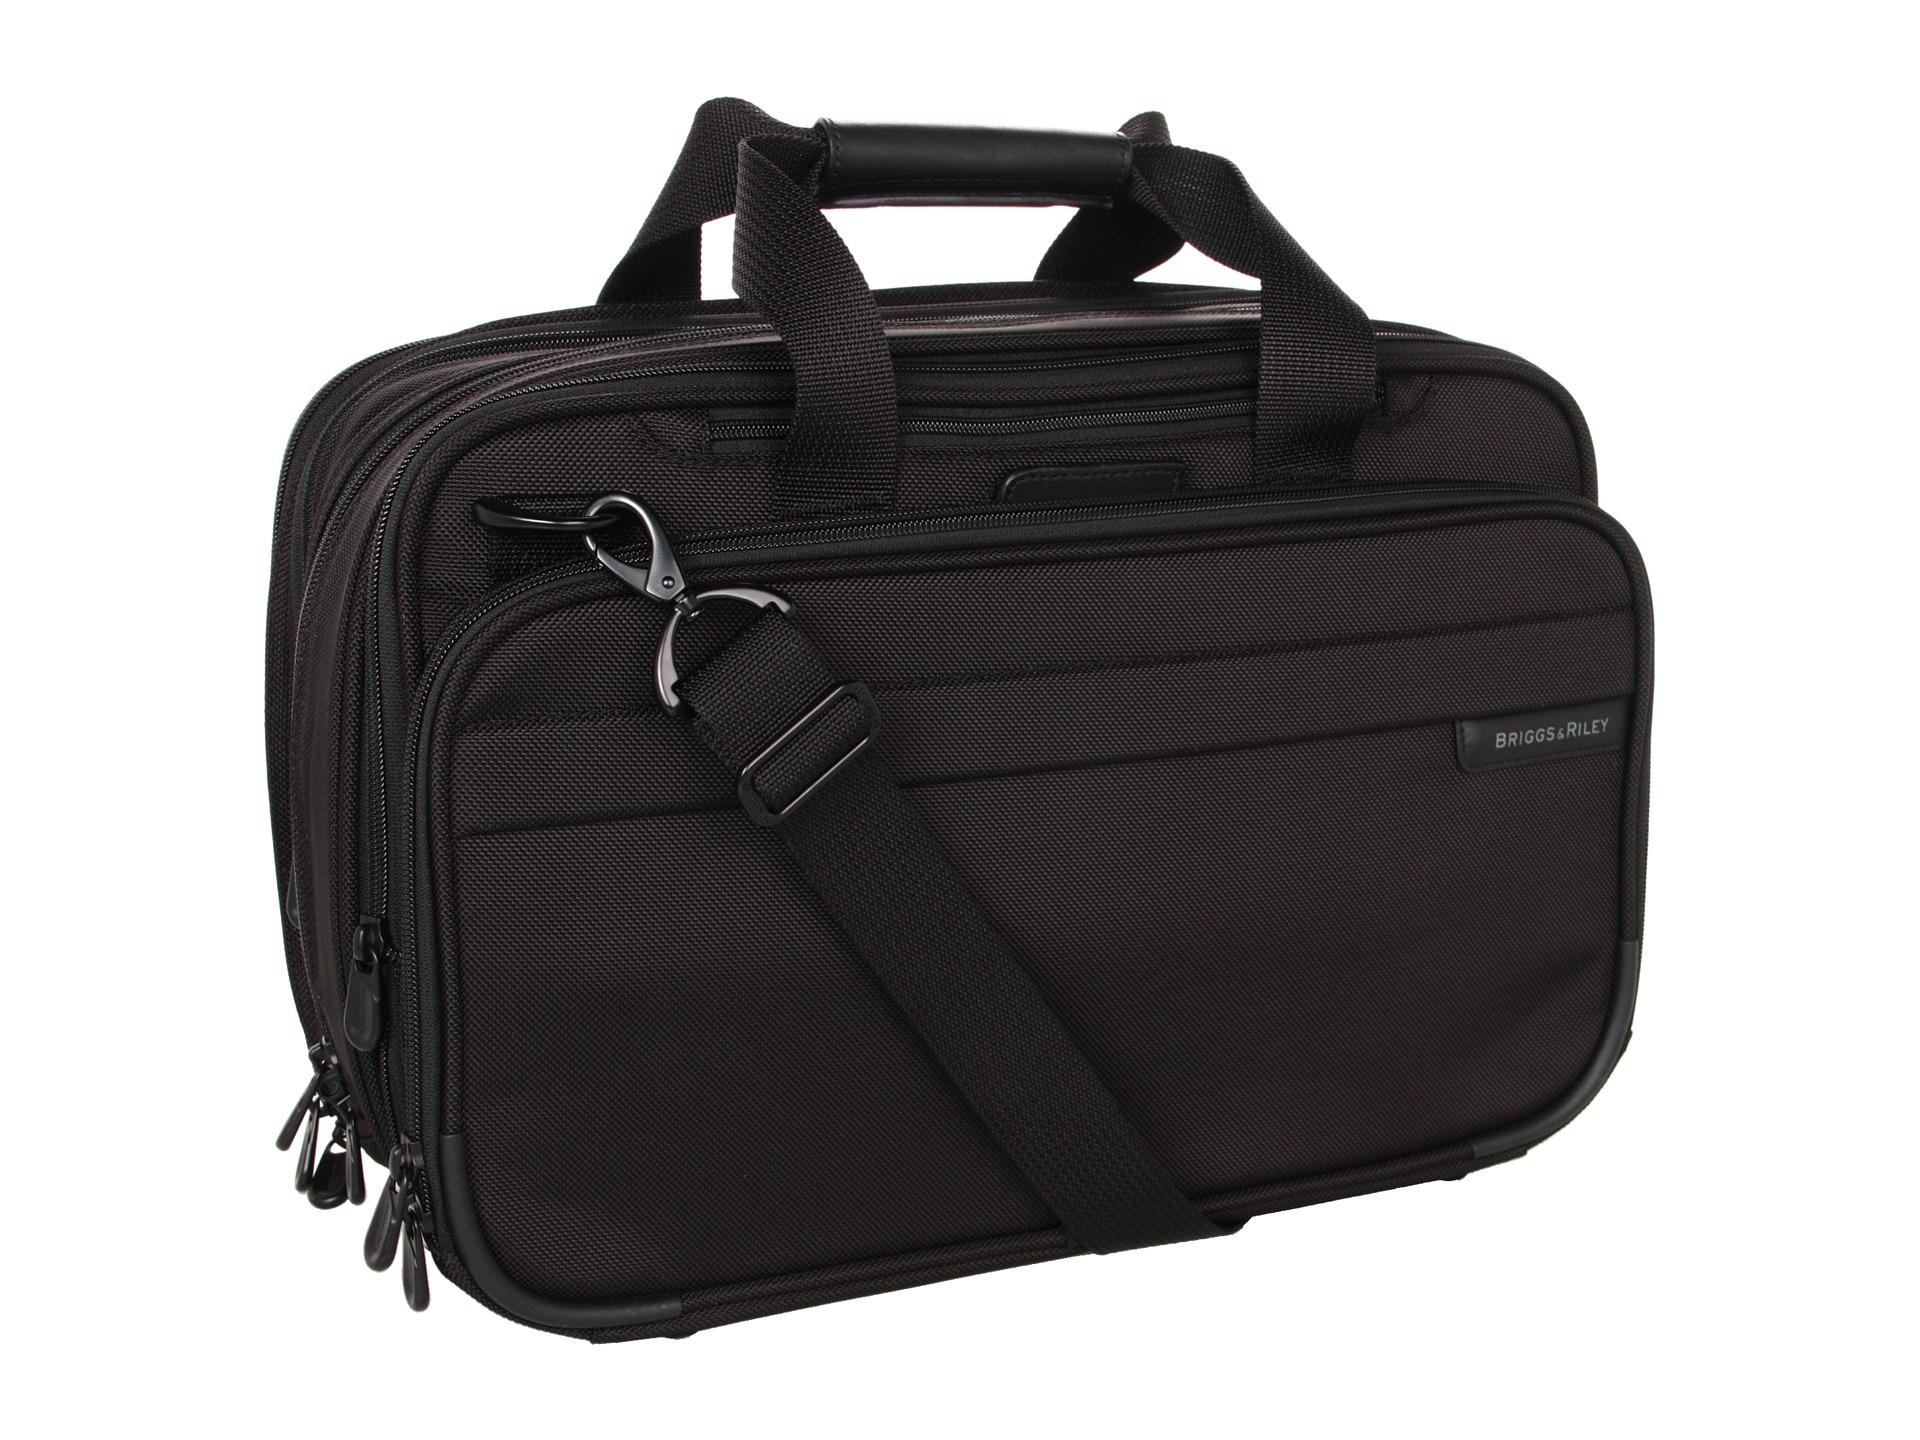 briggs riley baseline expandable cabin bag zappos